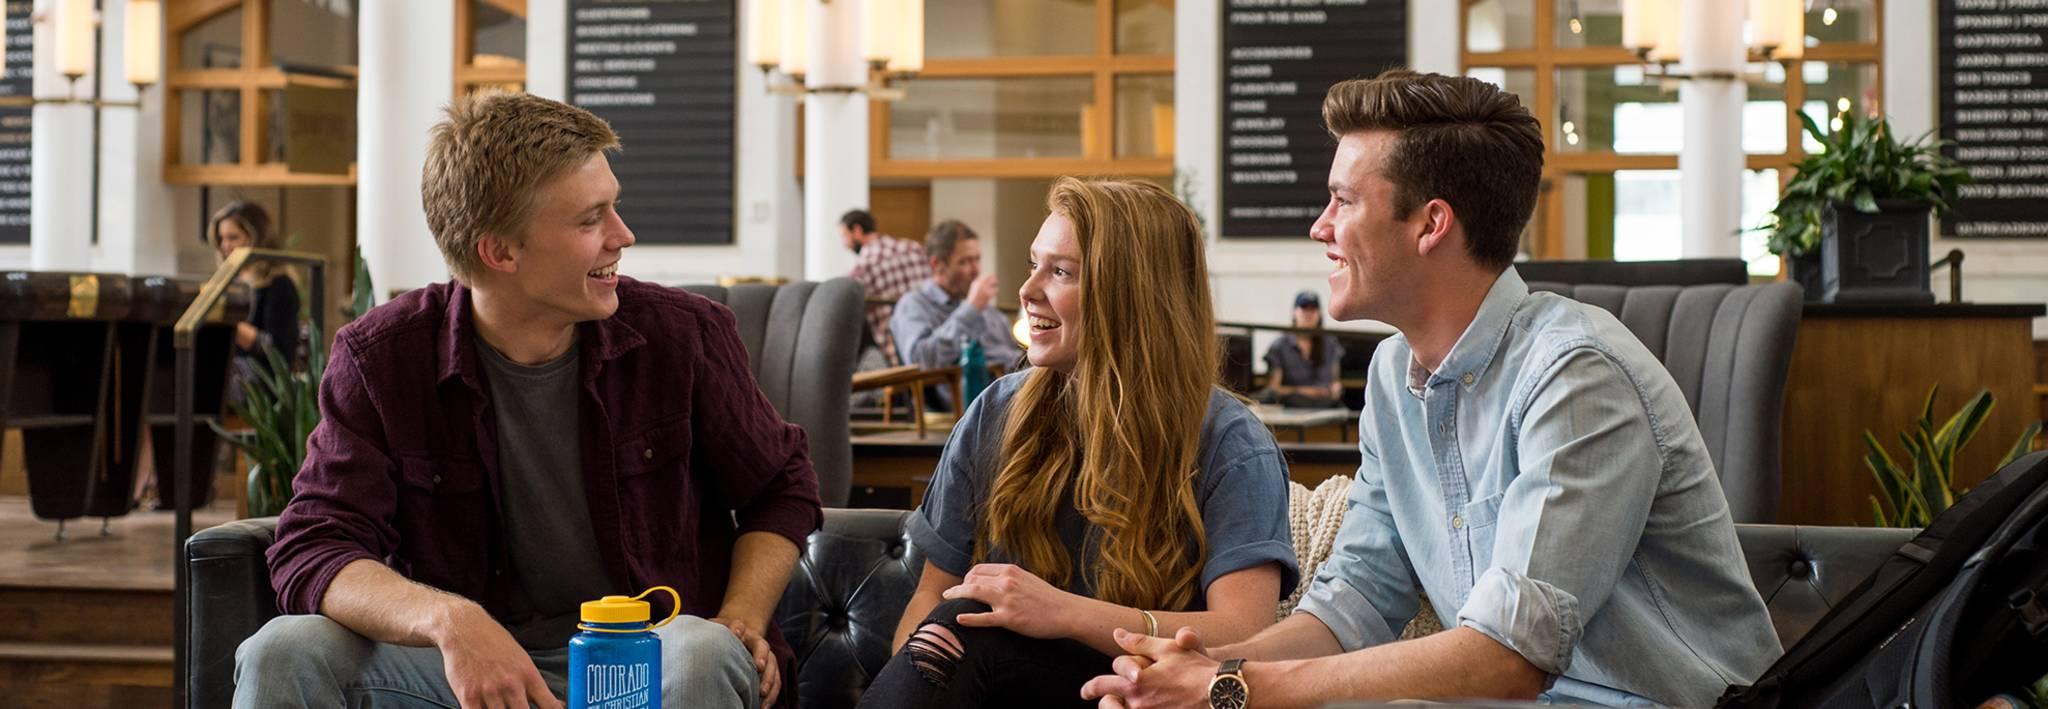 Colorado Christian University students talking in Denver.